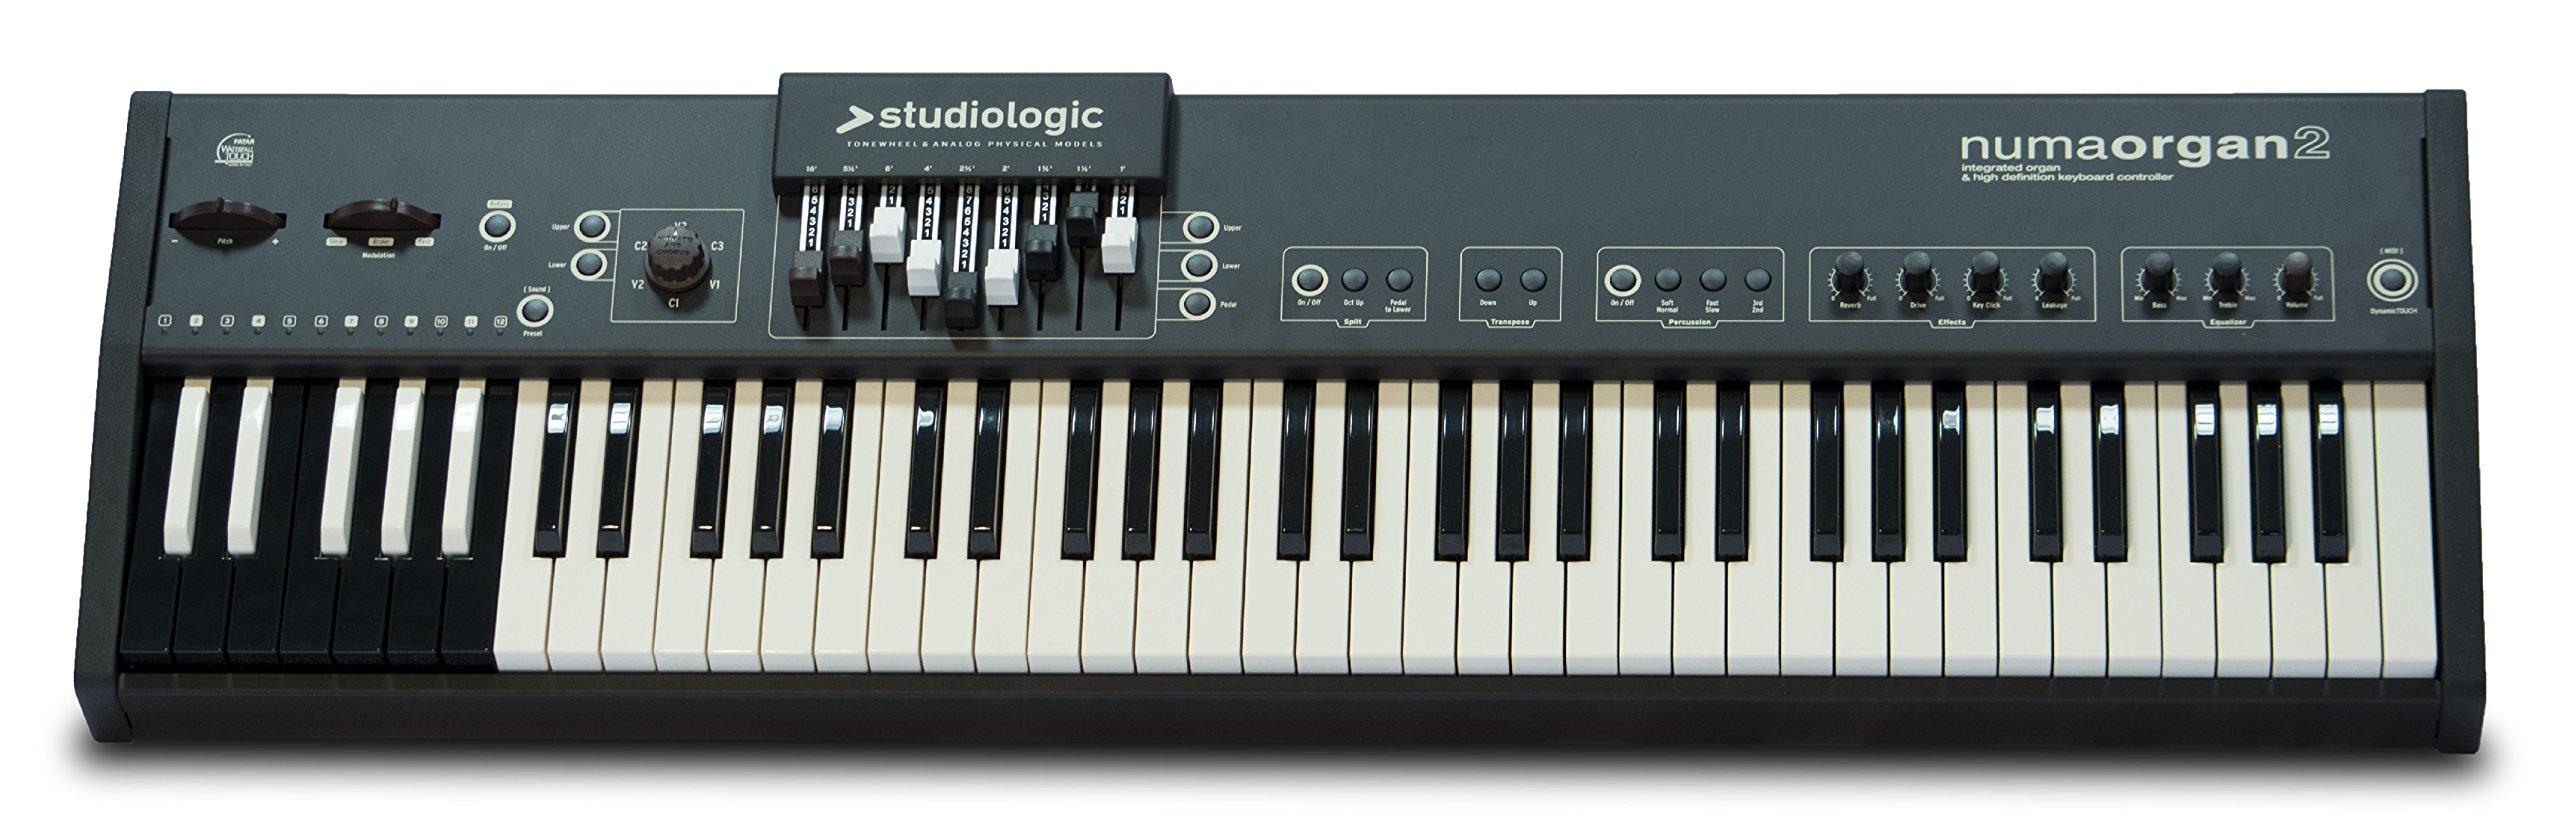 Studiologic NUMA-ORGAN-2 73-Key Integrated Digital Organ with Reversed Octave Midi Controller by Studiologic